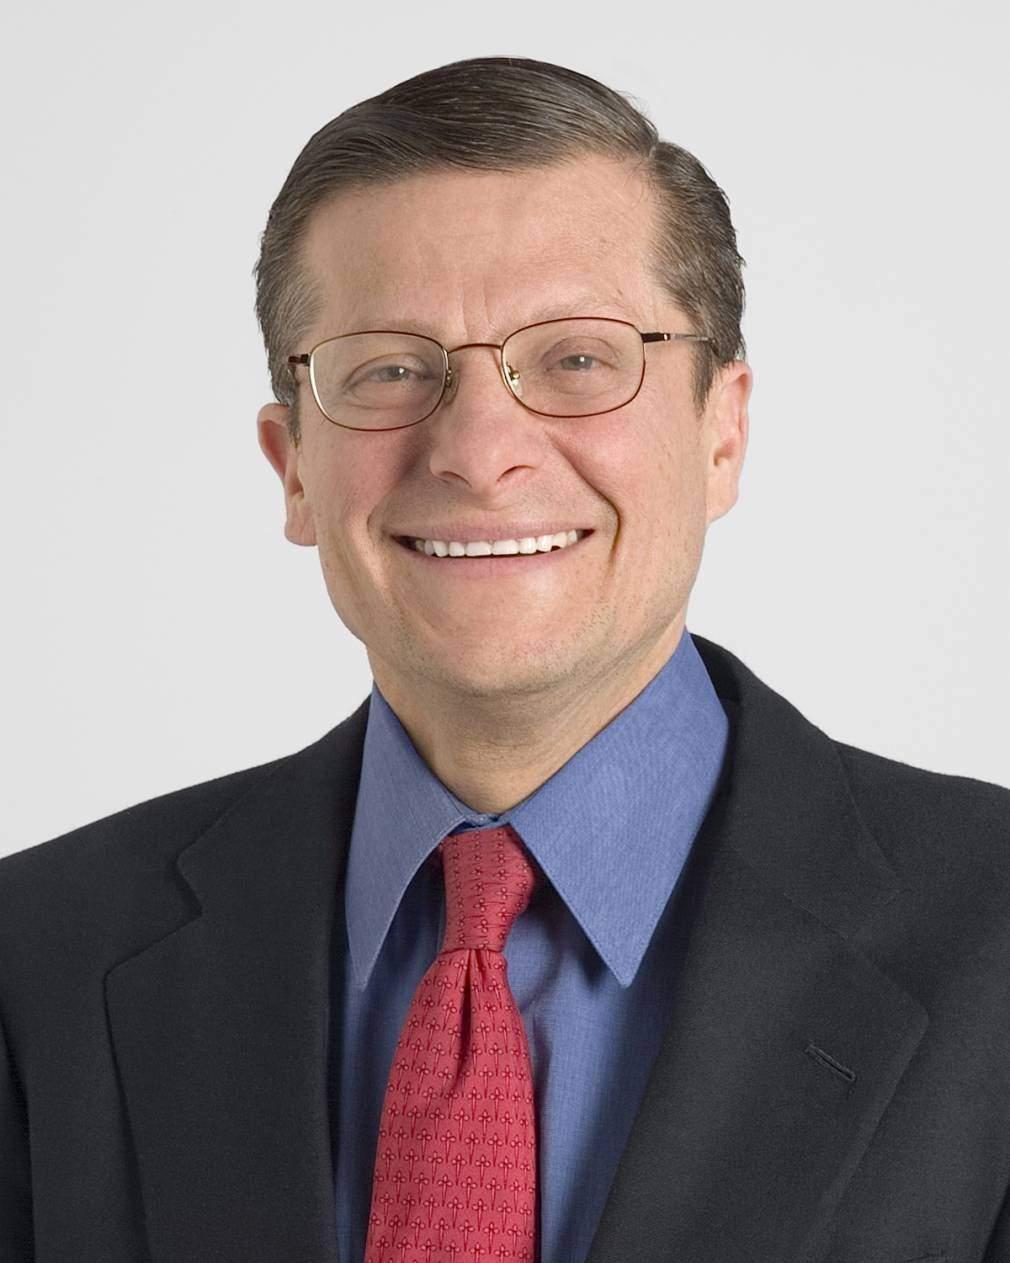 Dr Mike Roizen